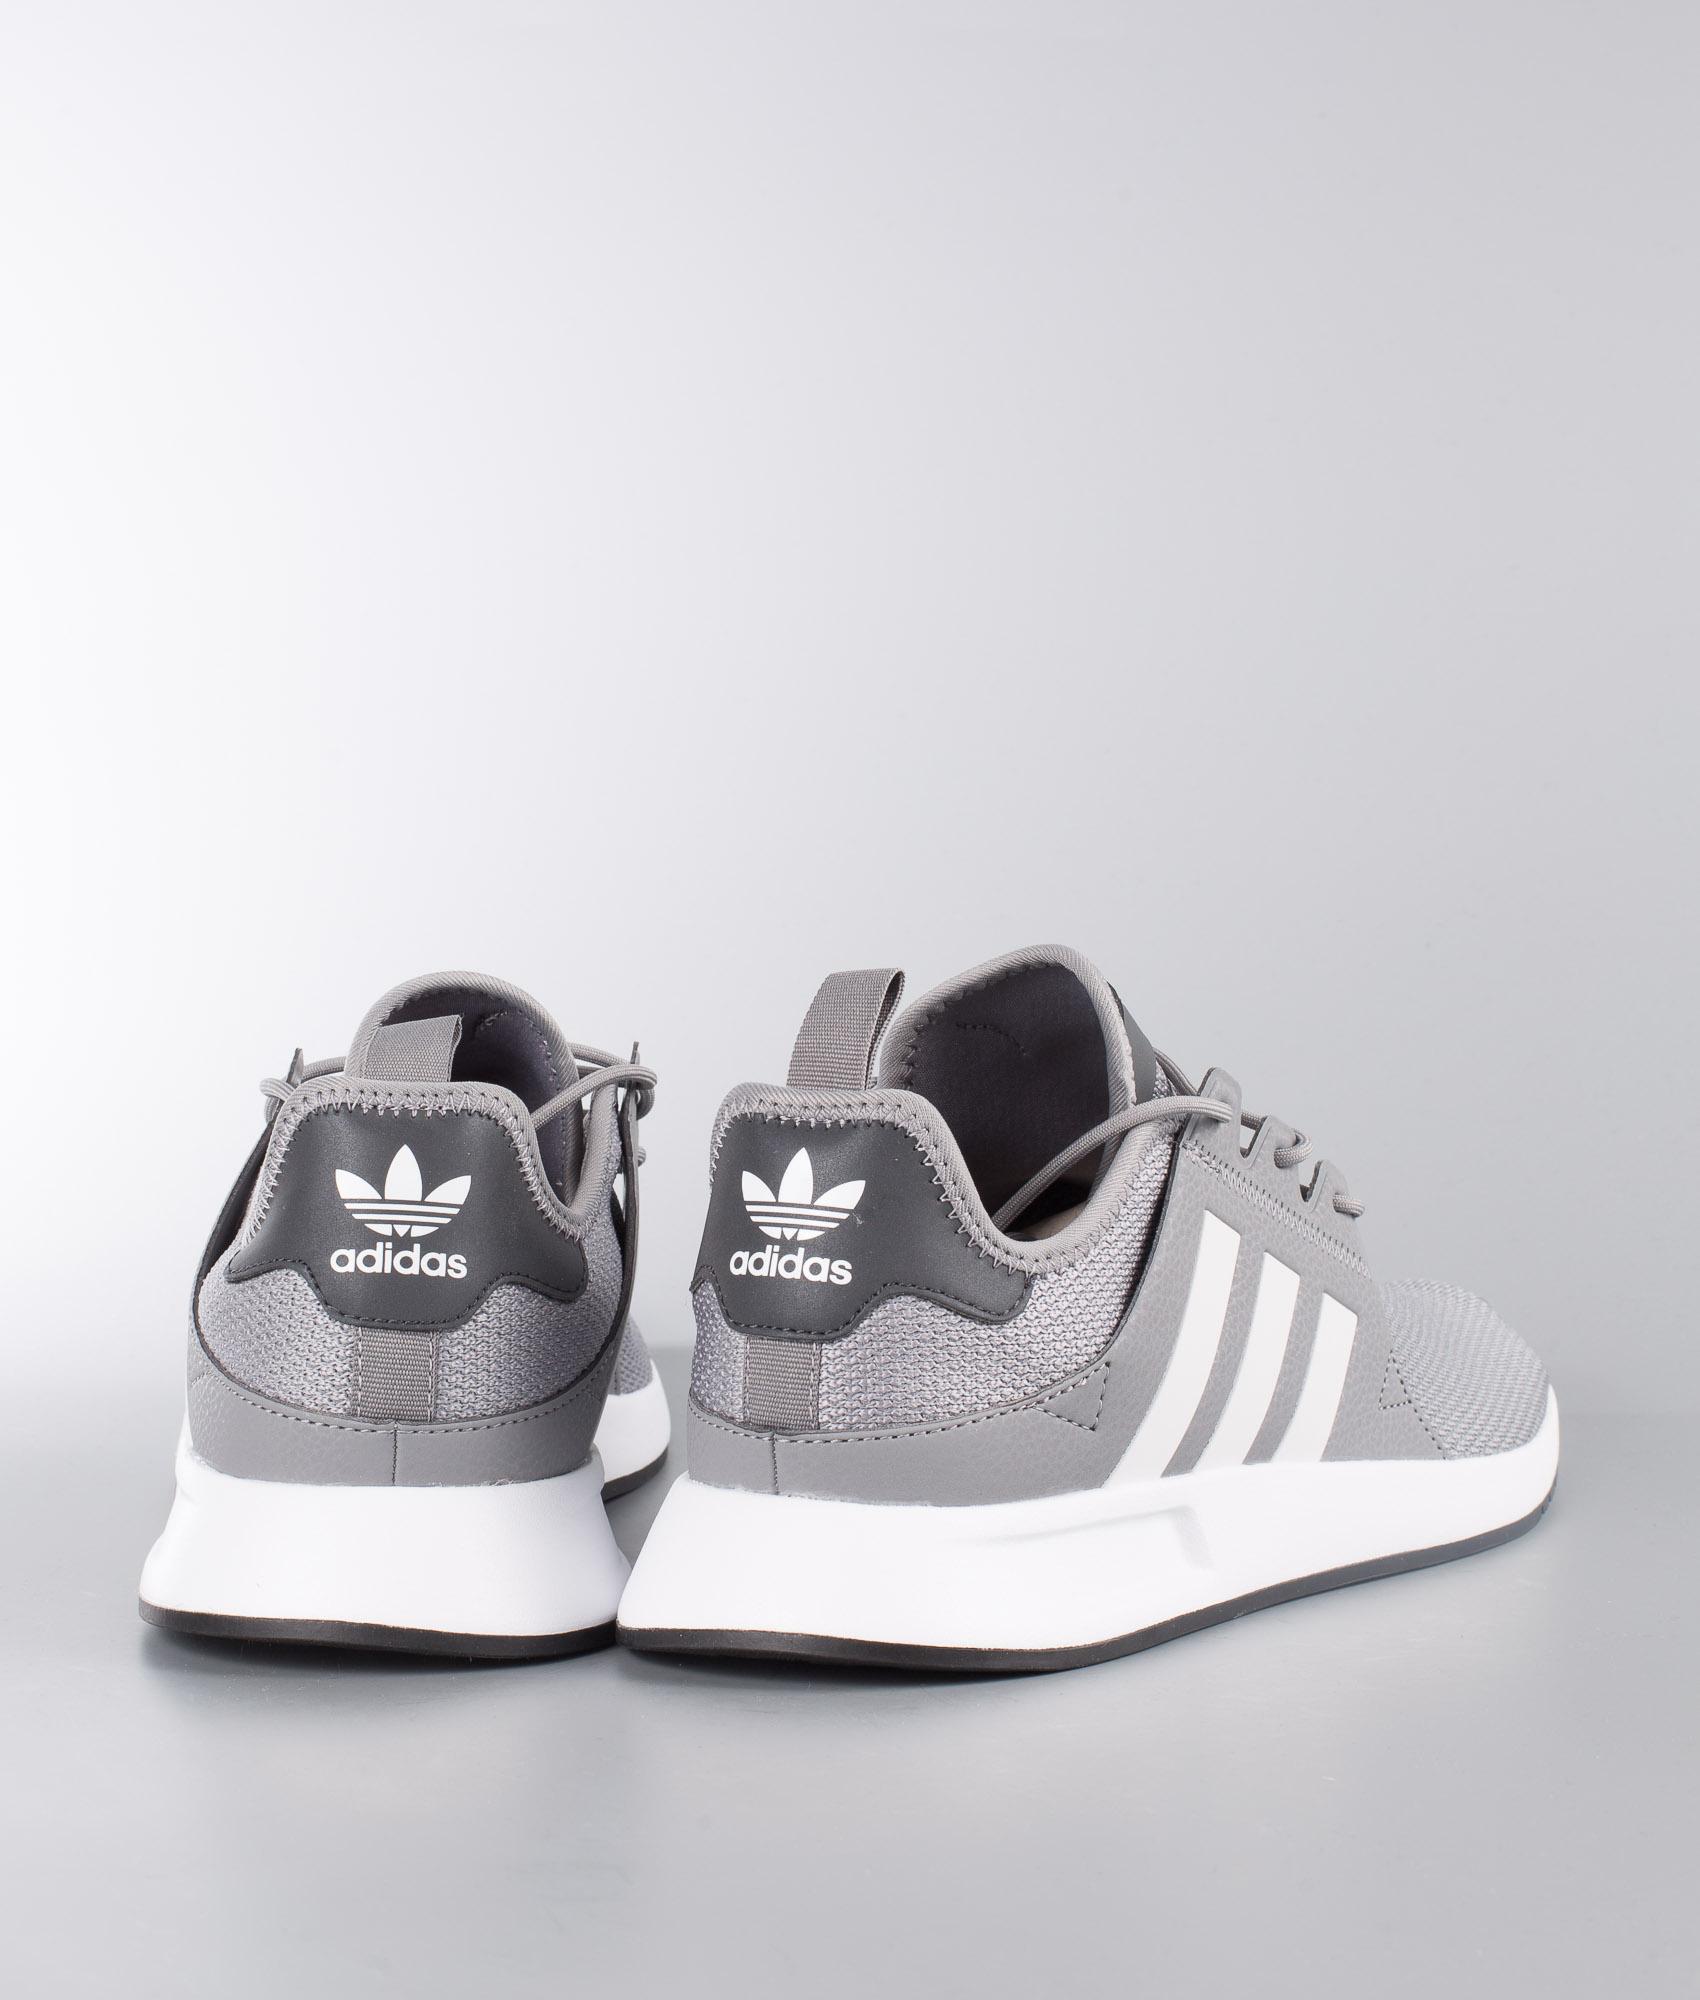 Grey Schuhe Originals plr X Whitecarbon Adidas Threefootwear QdrthCxs